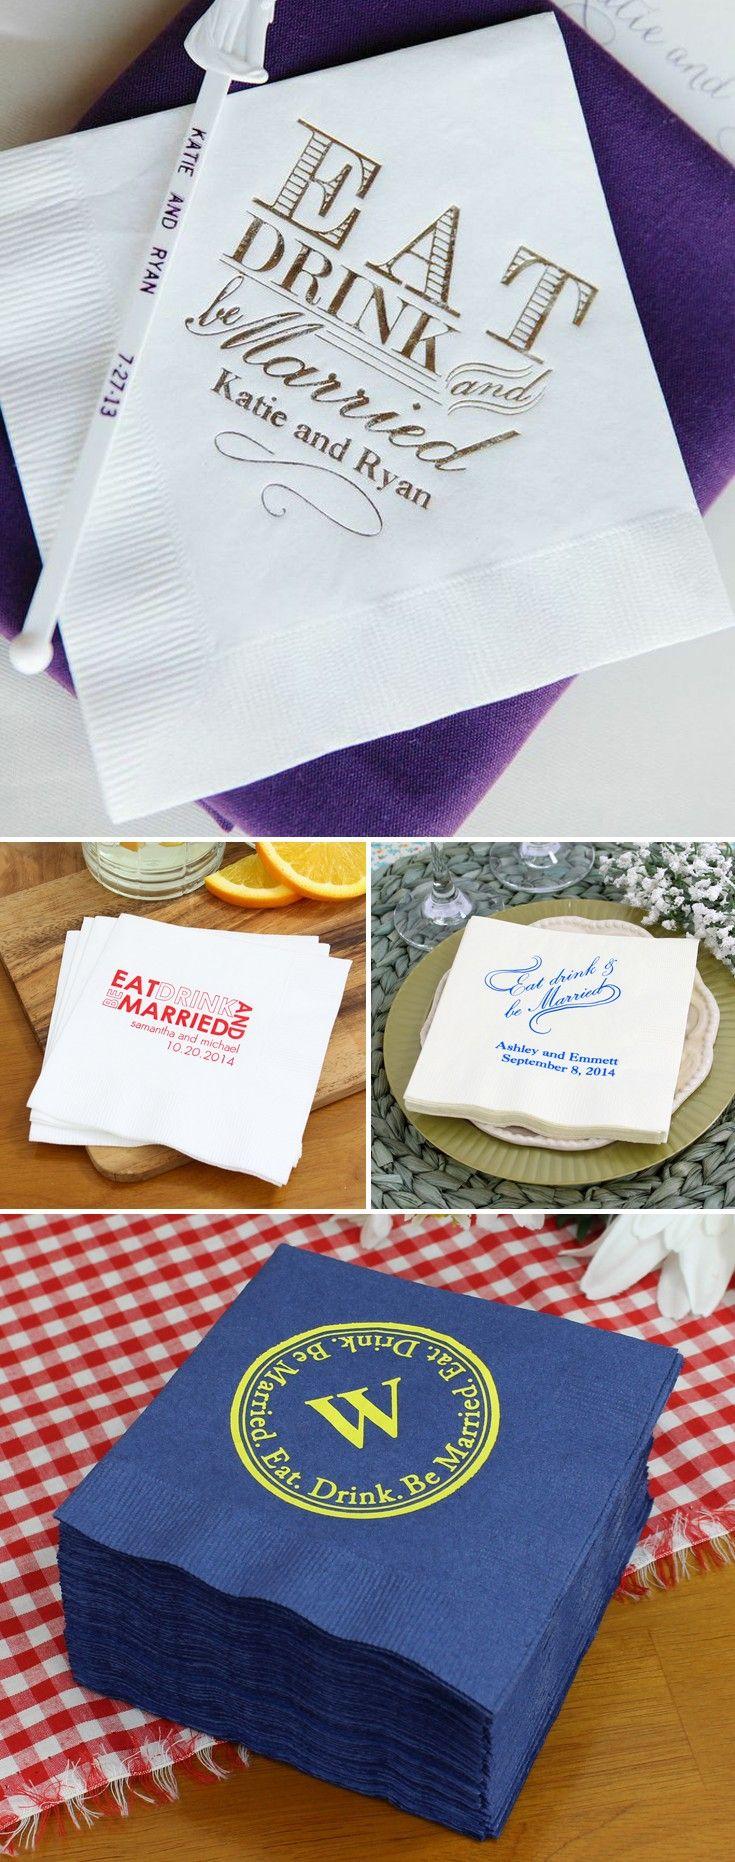 best 25 wedding cocktail napkins ideas on pinterest wedding napkins diy wedding napkins and. Black Bedroom Furniture Sets. Home Design Ideas